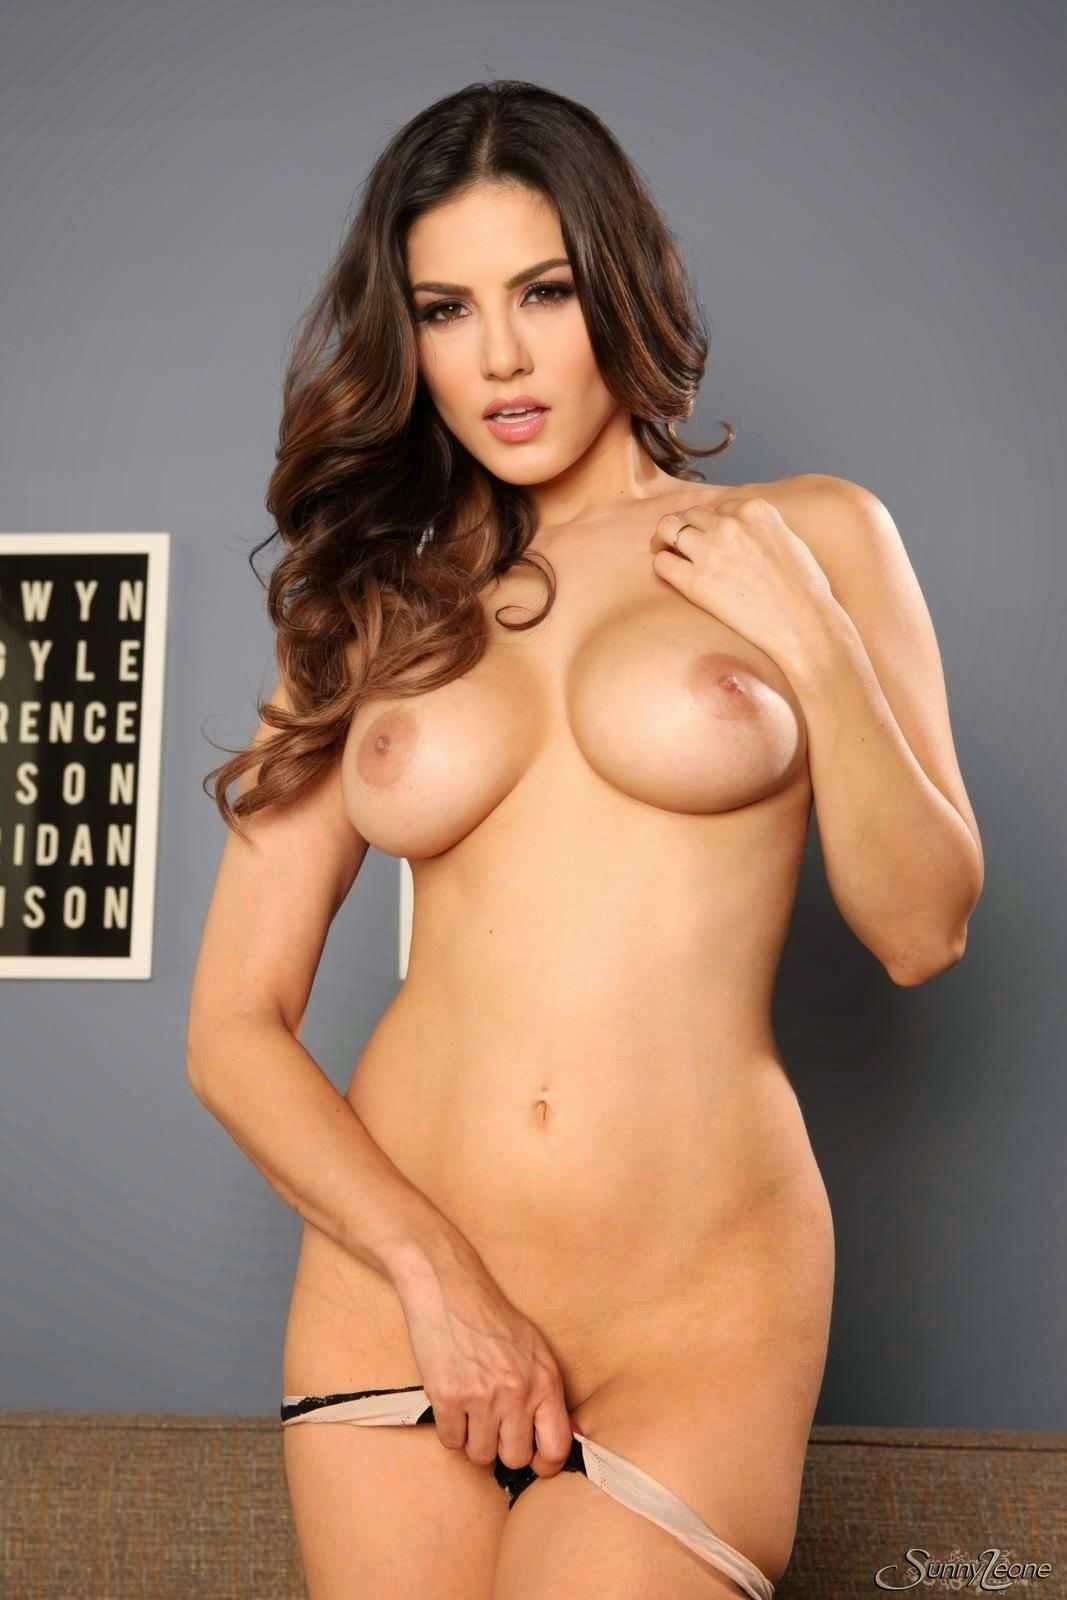 http://xxxpronworld.com/sunny-leone-show-sexy-boobs-pussy/